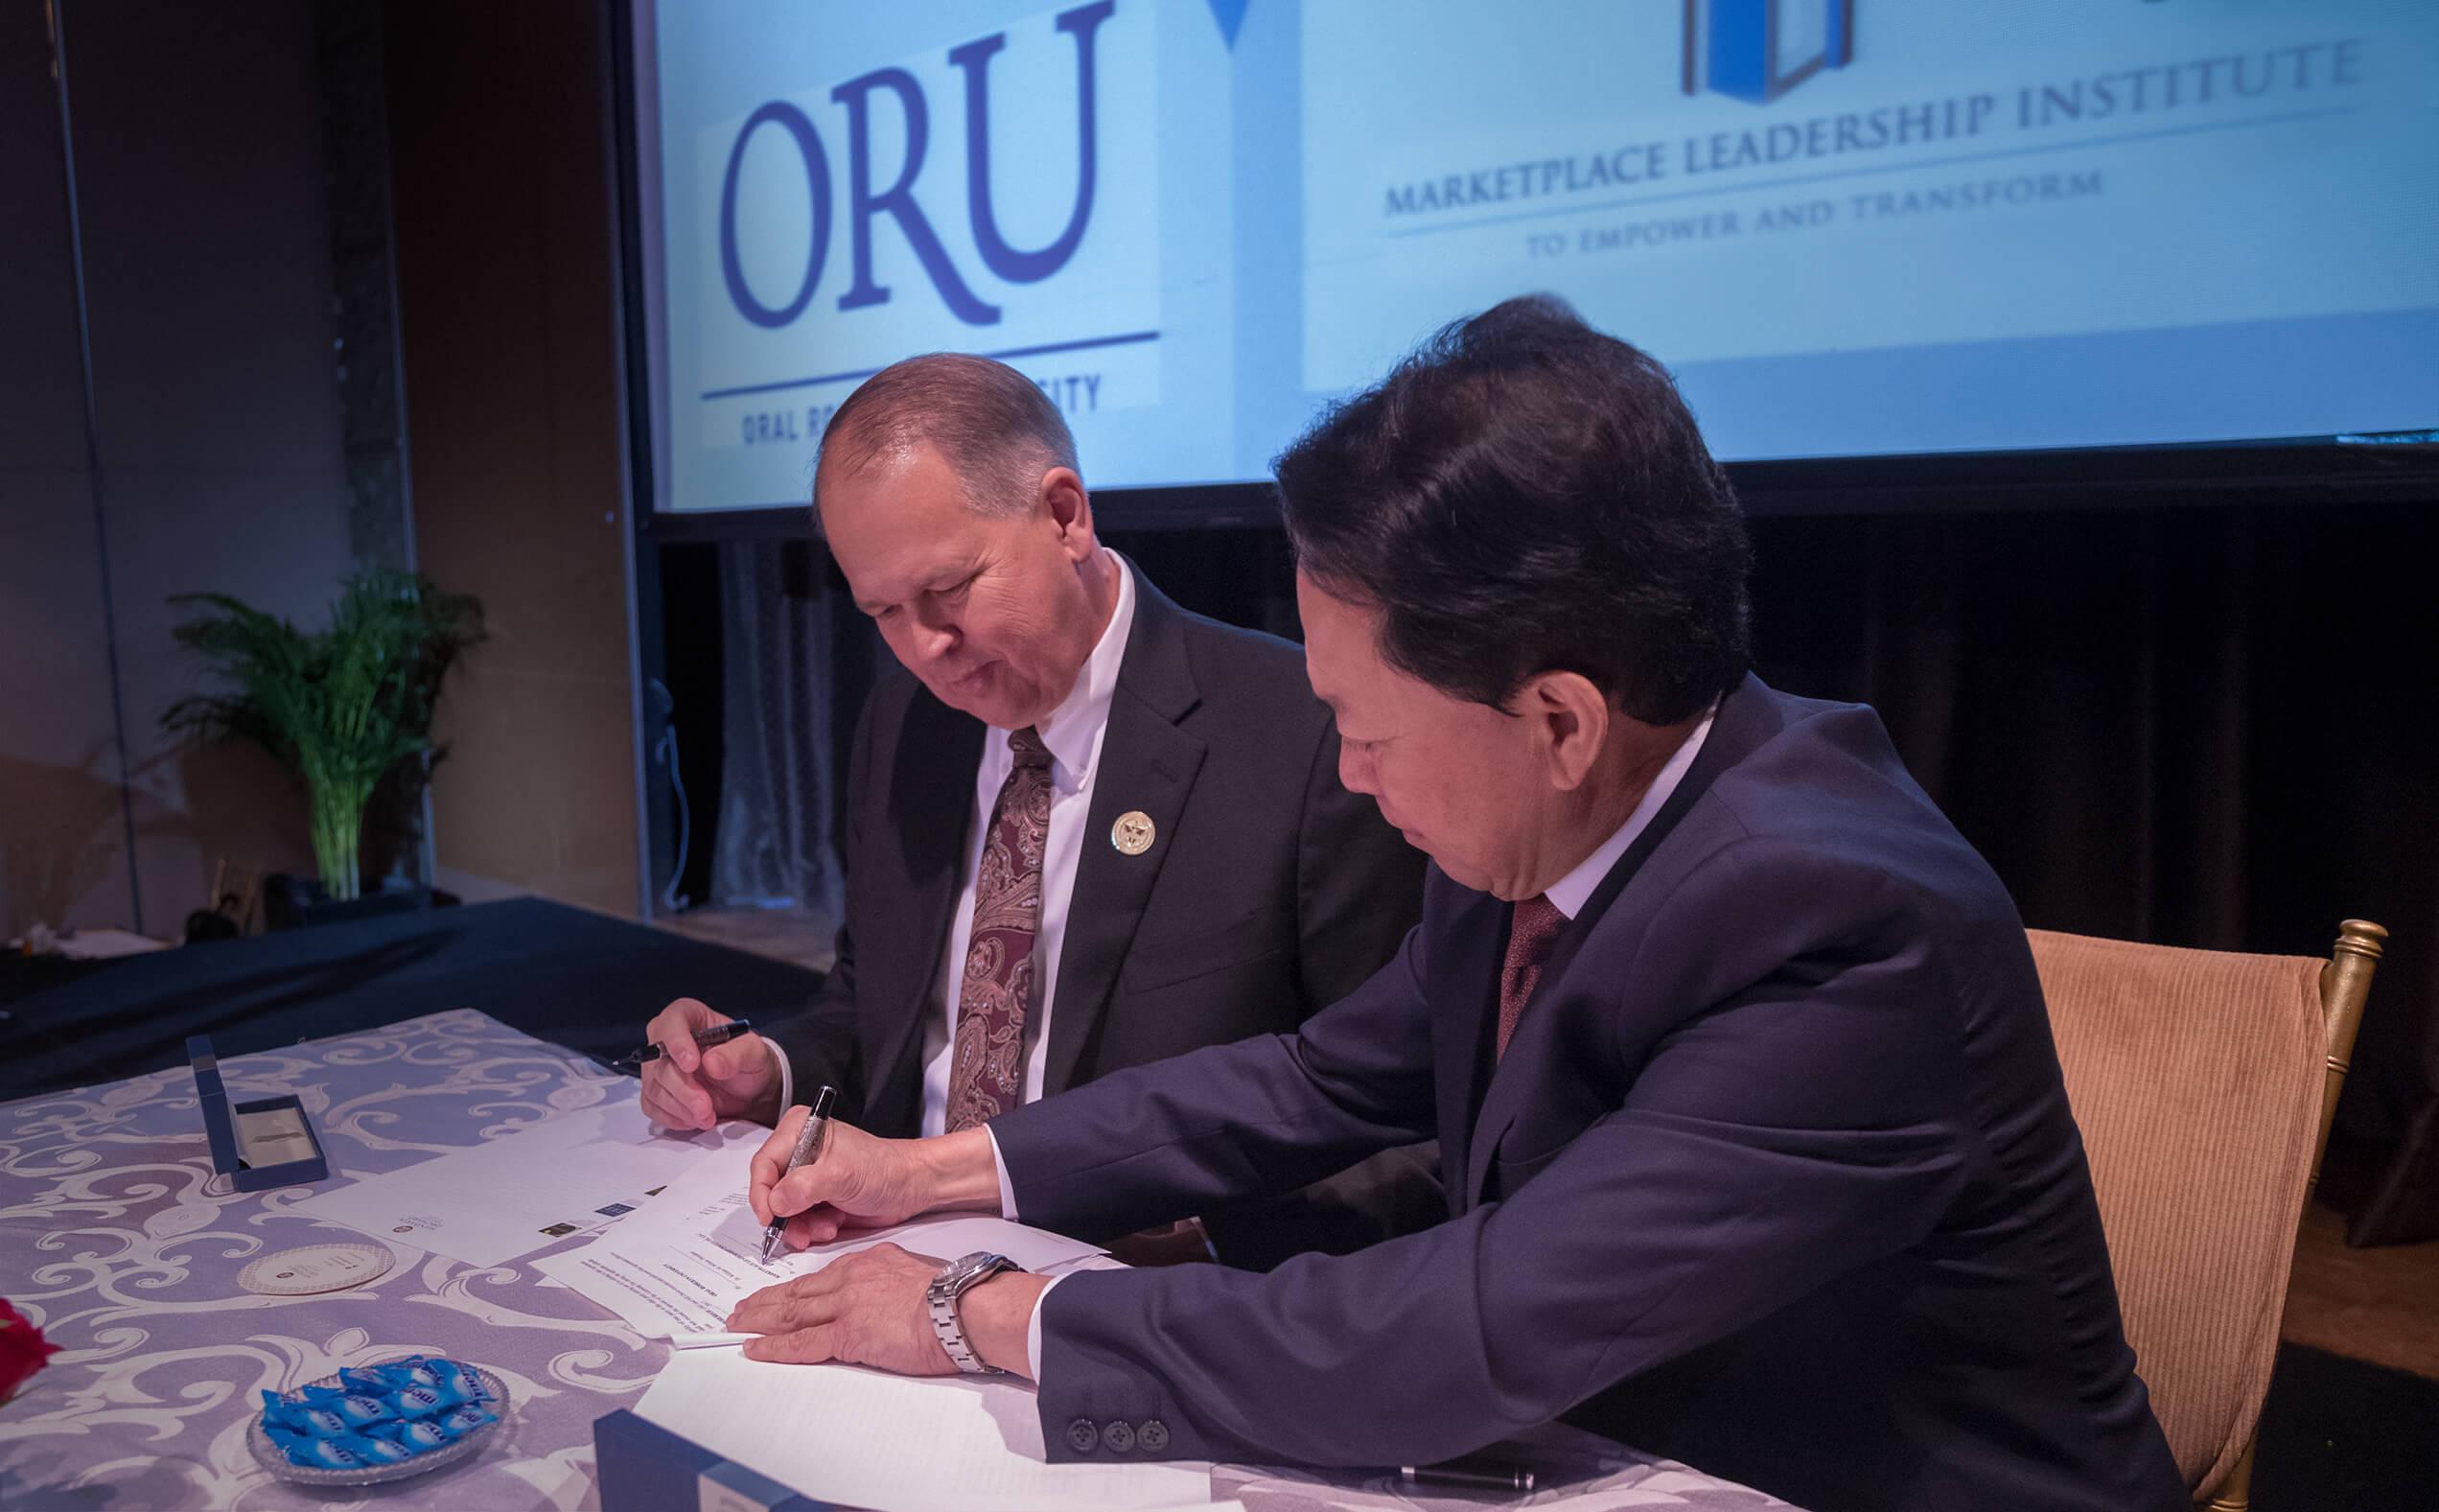 ORU MLI Sign Agreement